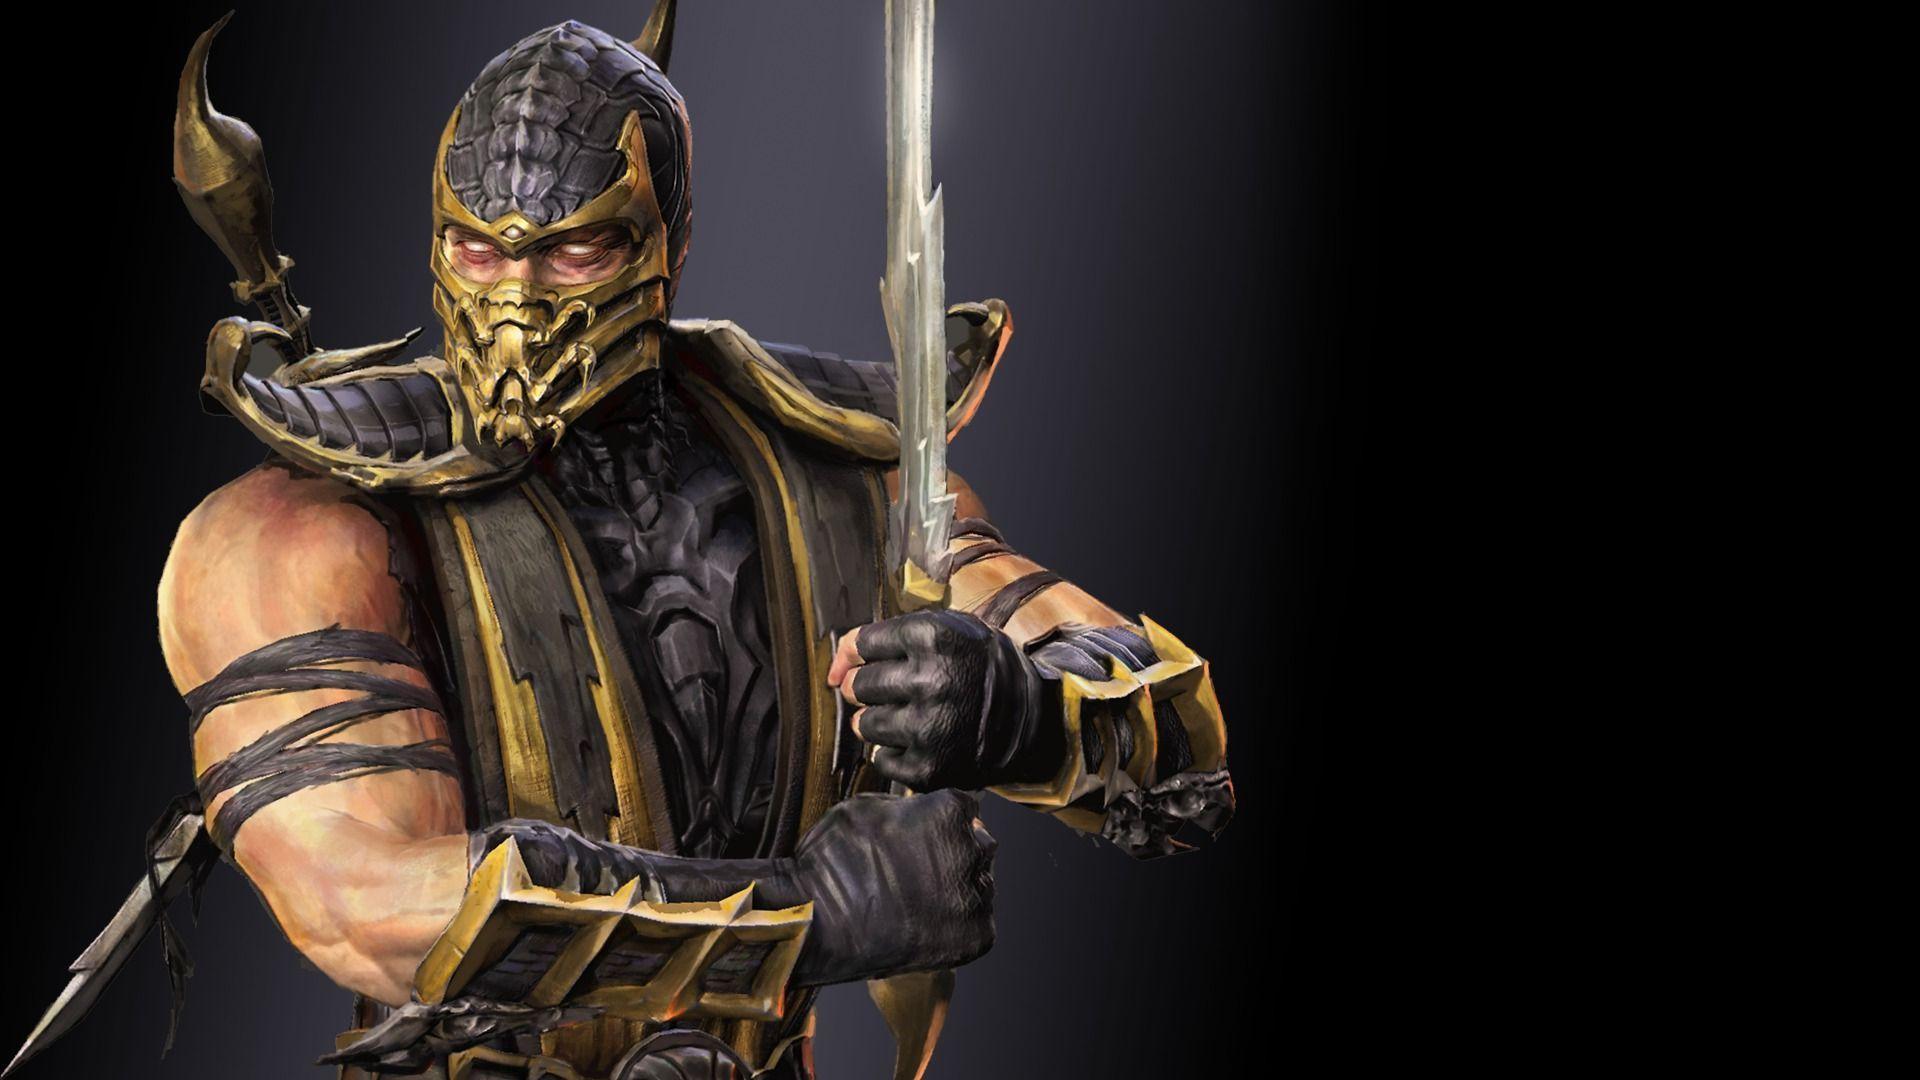 Scorpion   Mortal Kombat wallpaper   1206992 1920x1080